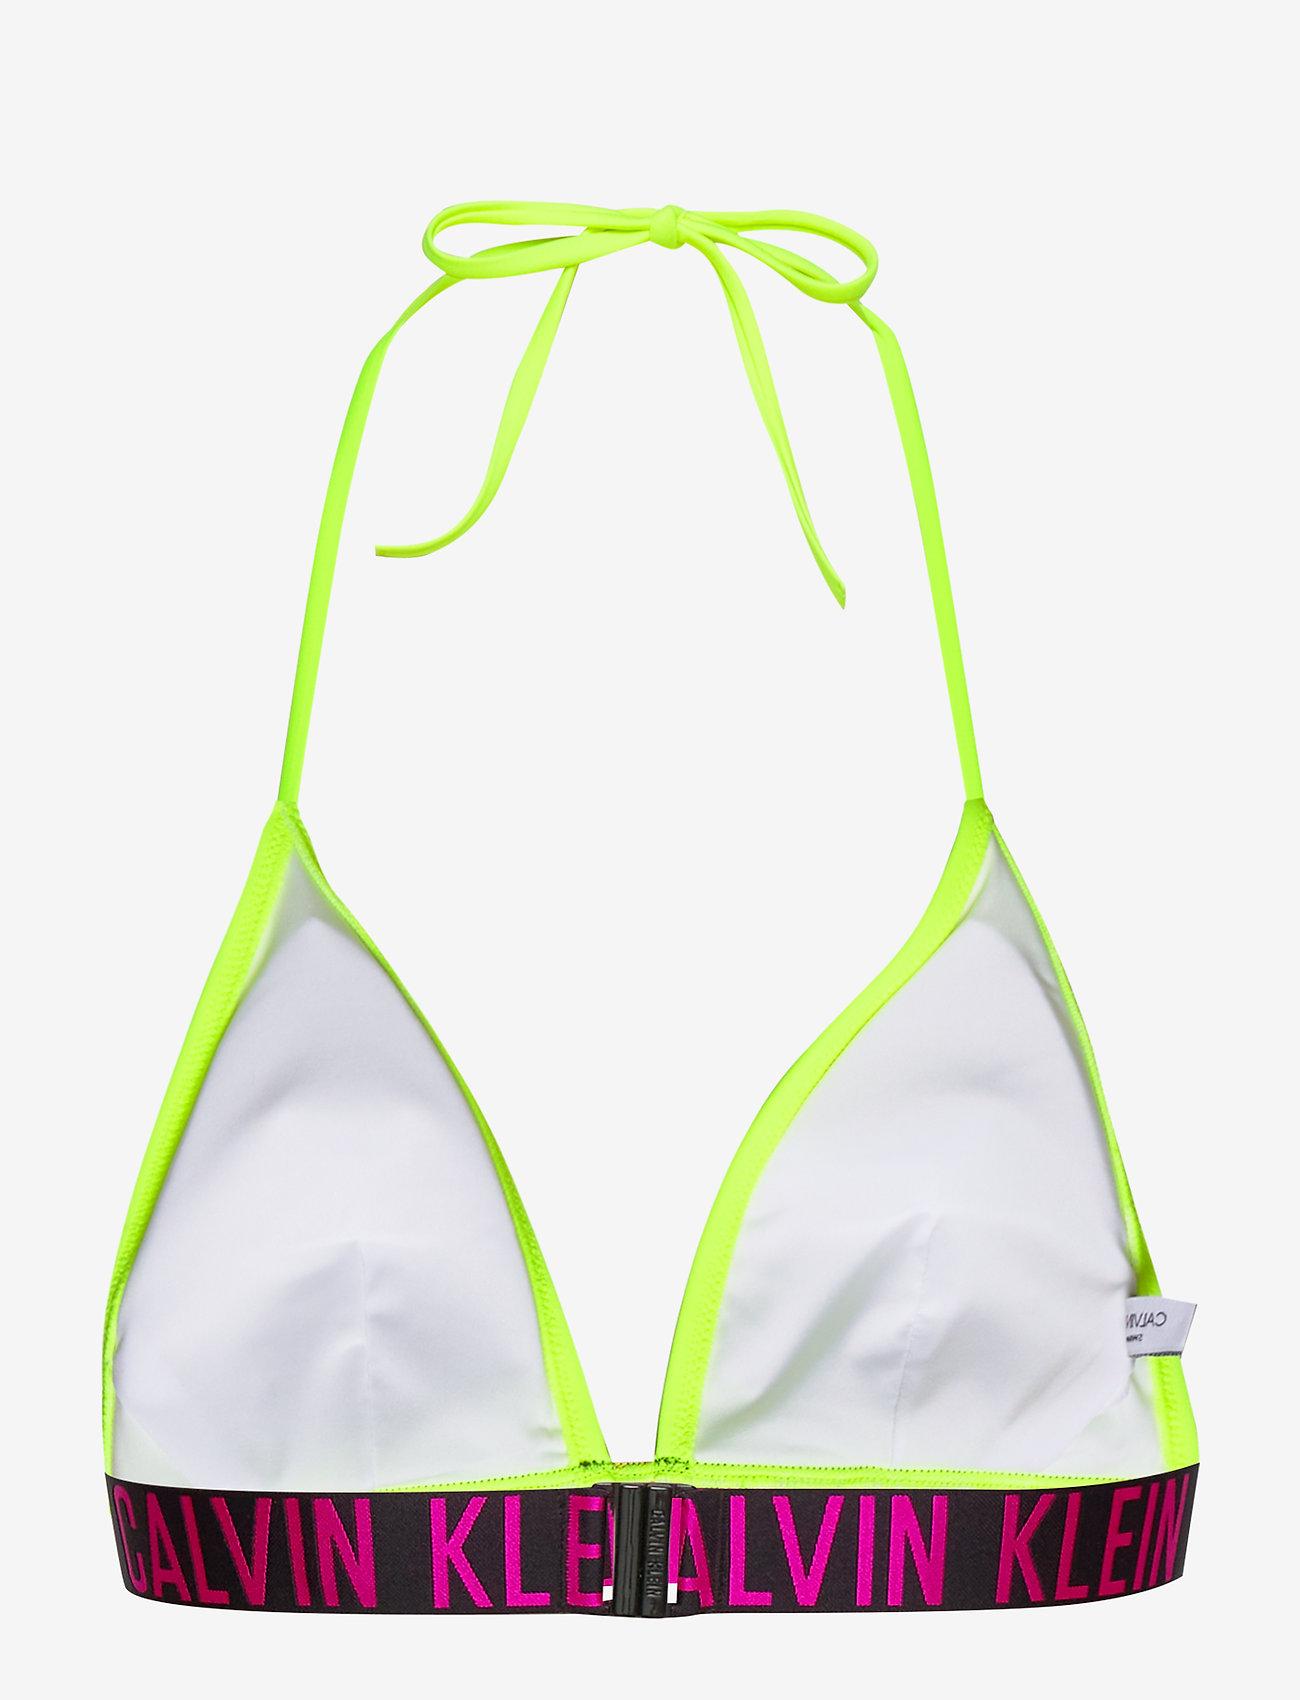 haka svar Imitation  Fixed Triangle-rp-n (Safety Yellow) (34.93 €) - Calvin Klein ...